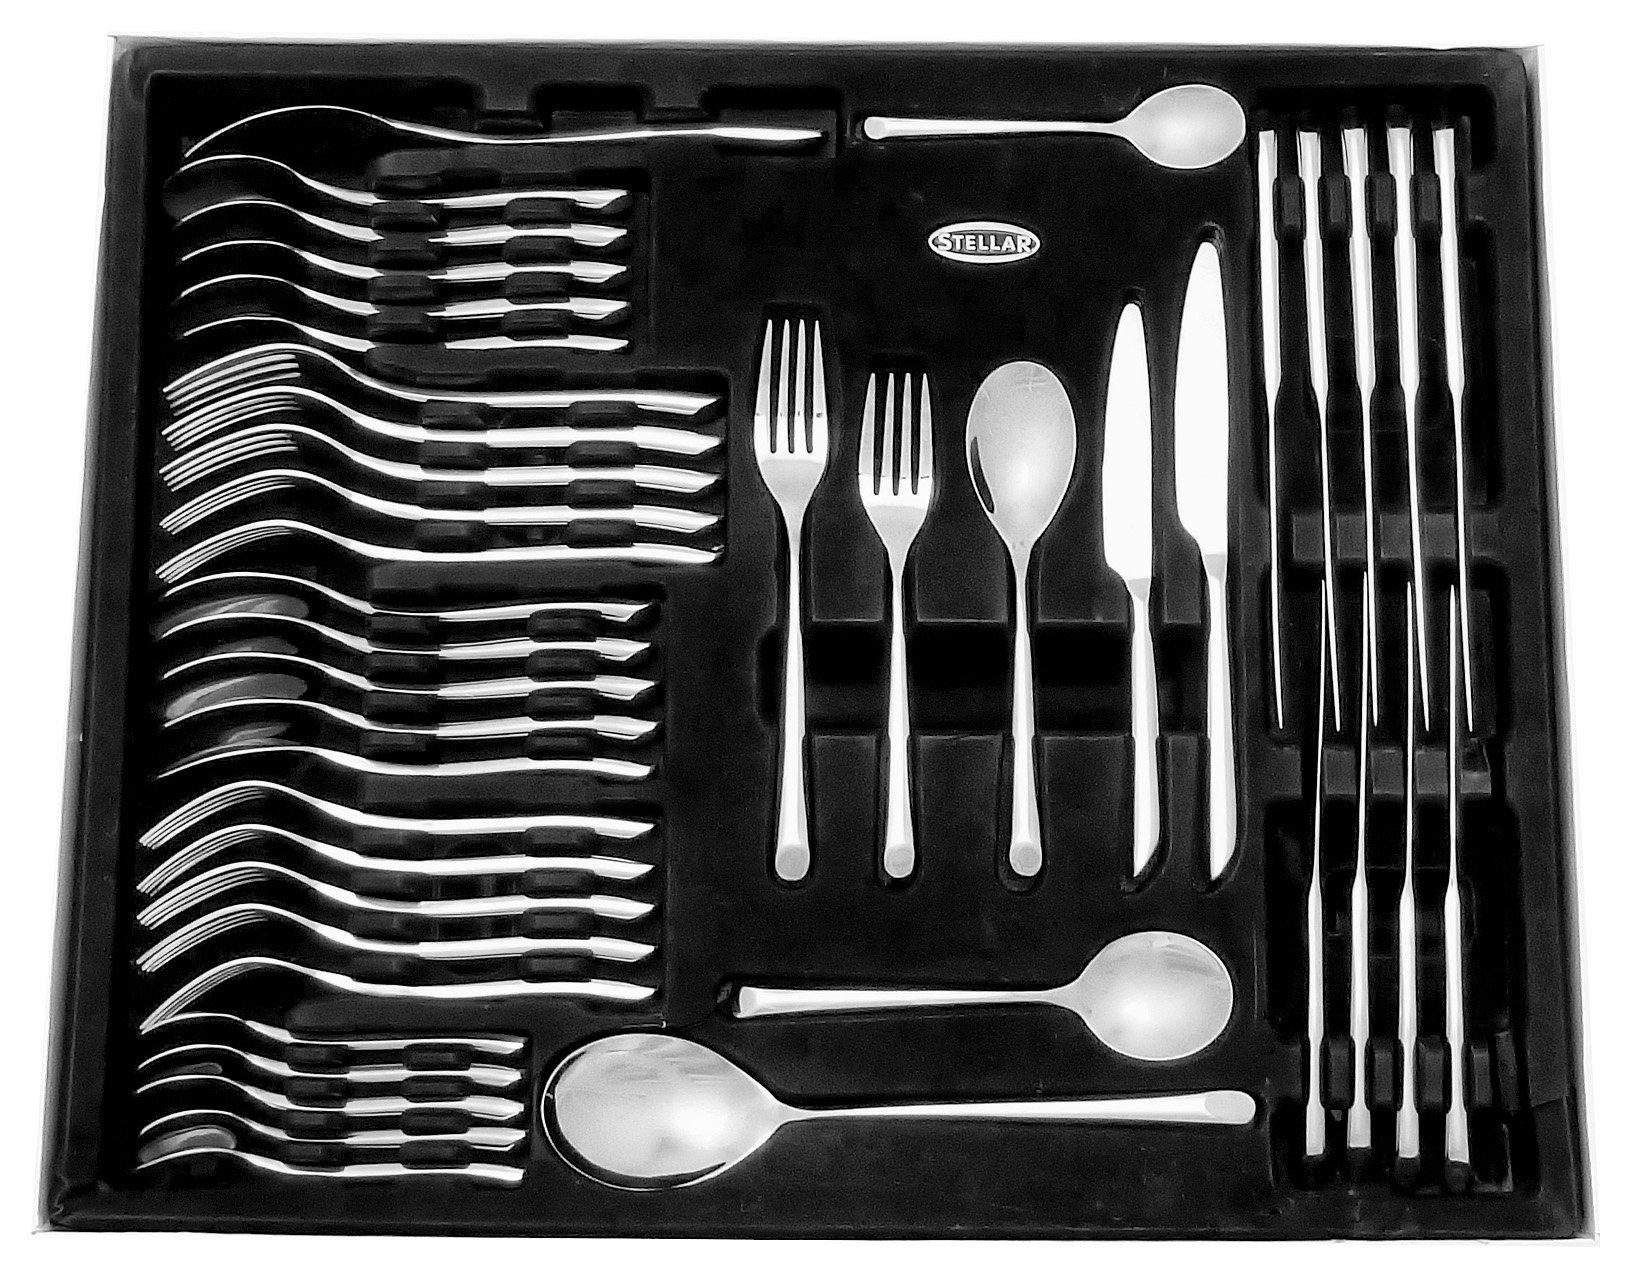 Stellar Cutlery Raglan 44 Piece Gift Box Set